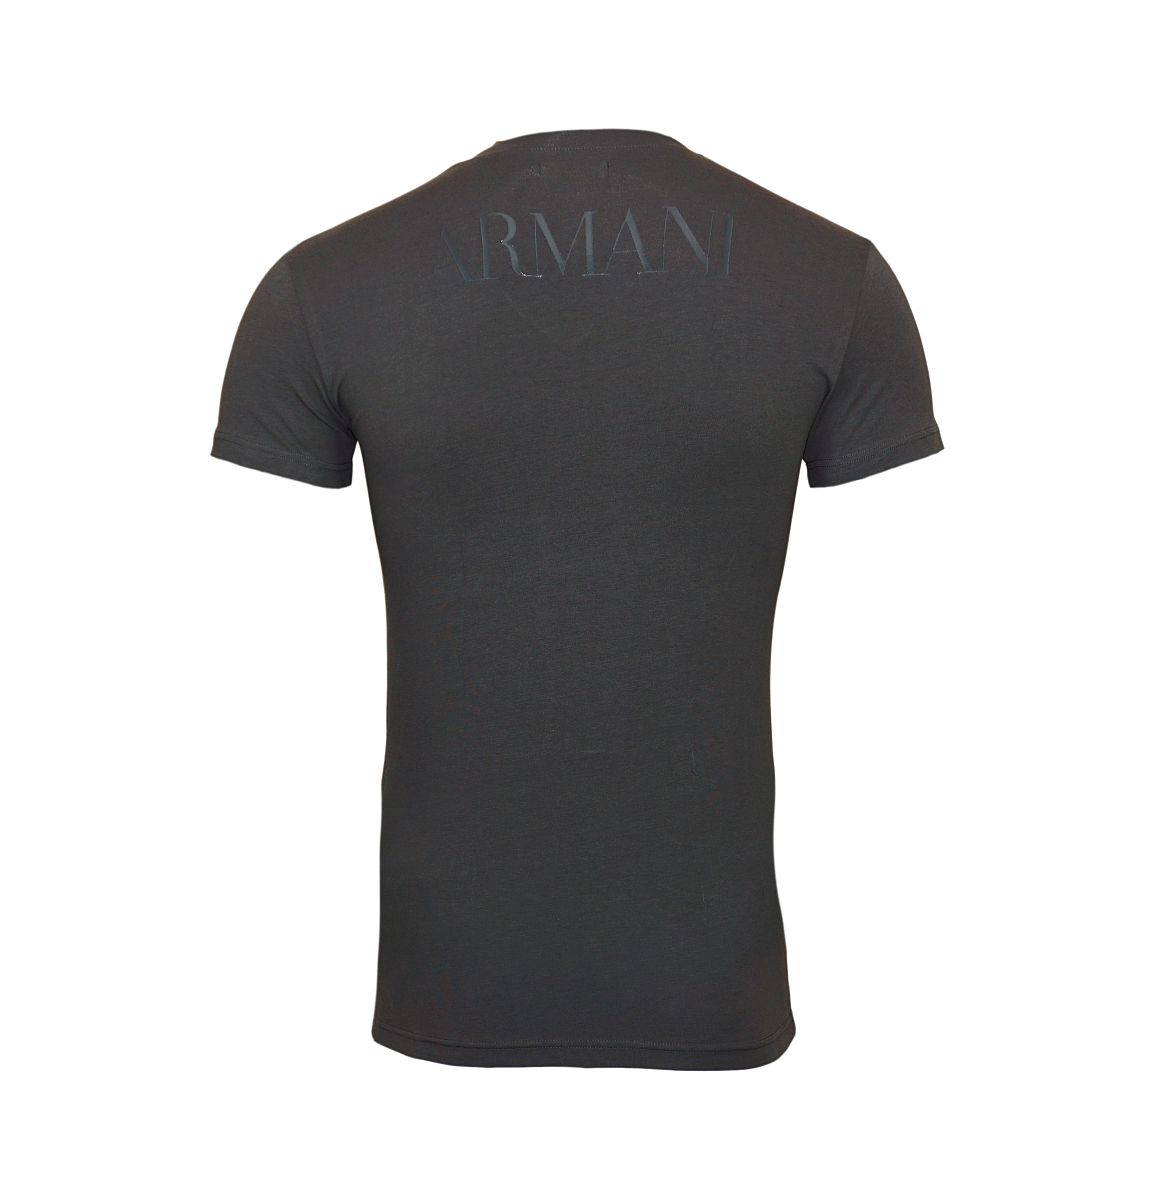 Emporio Armani T-Shirts V-Ausschnitt 110810 8P516 00044 ANTRACITE W18-EATS1